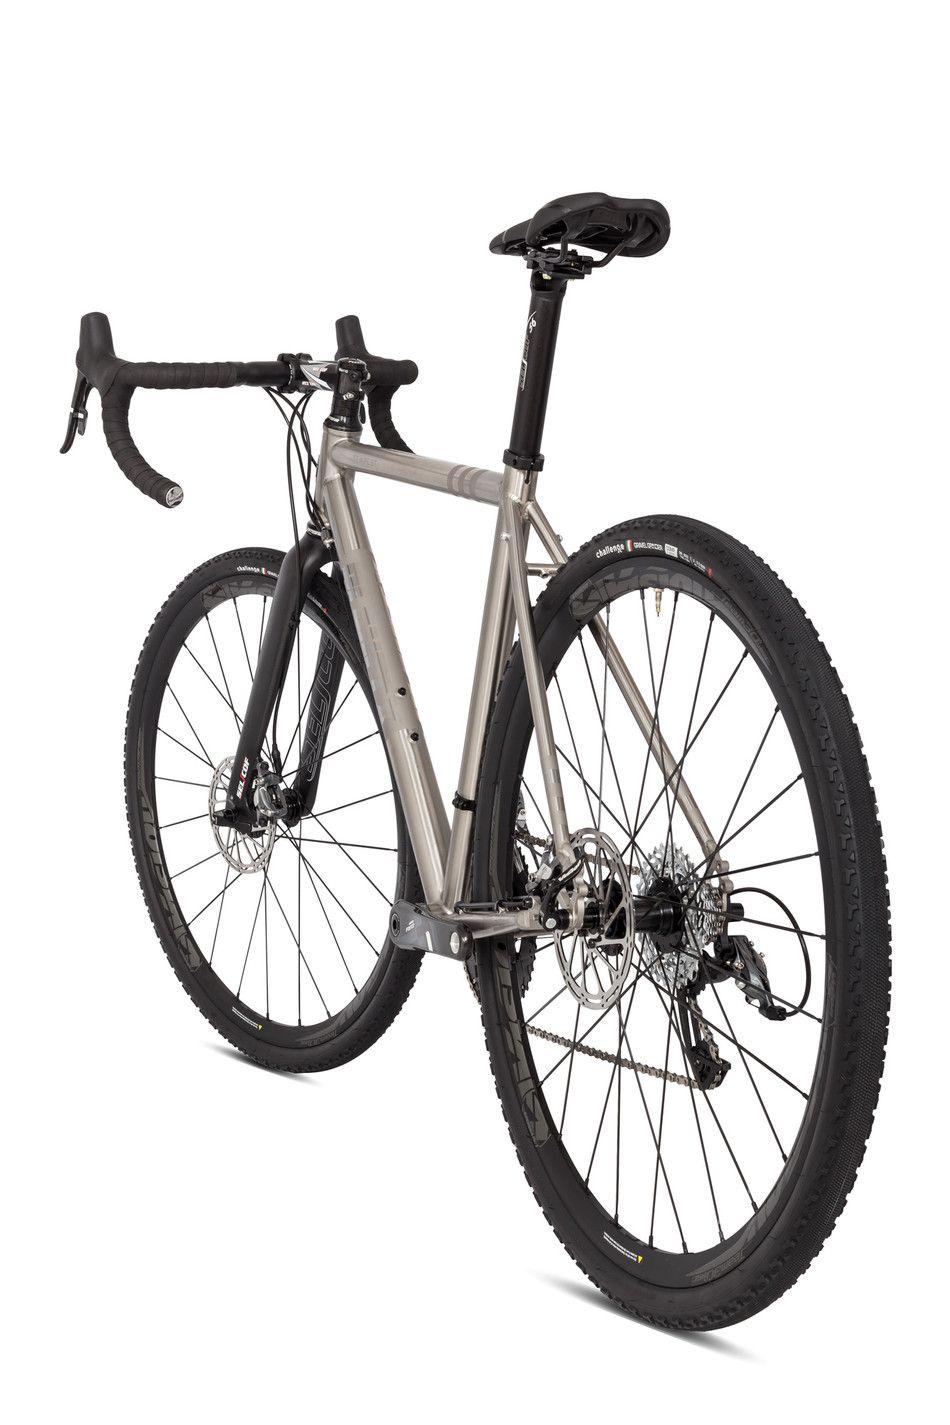 Planet X Tempest Titanium Gravel Road Bike Sram Force 22 HDR | bikes ...